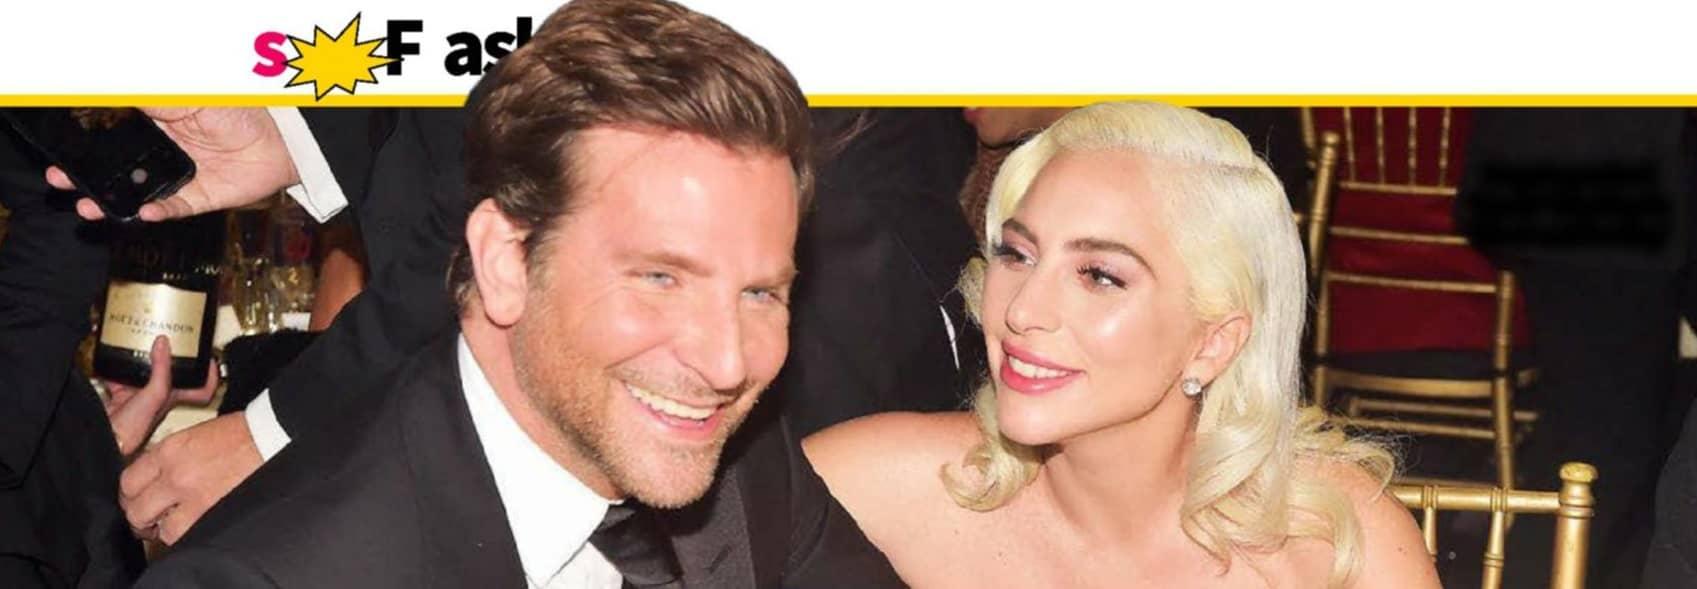 Tatt's Inappropriate! - Gaga's Ott Tribute